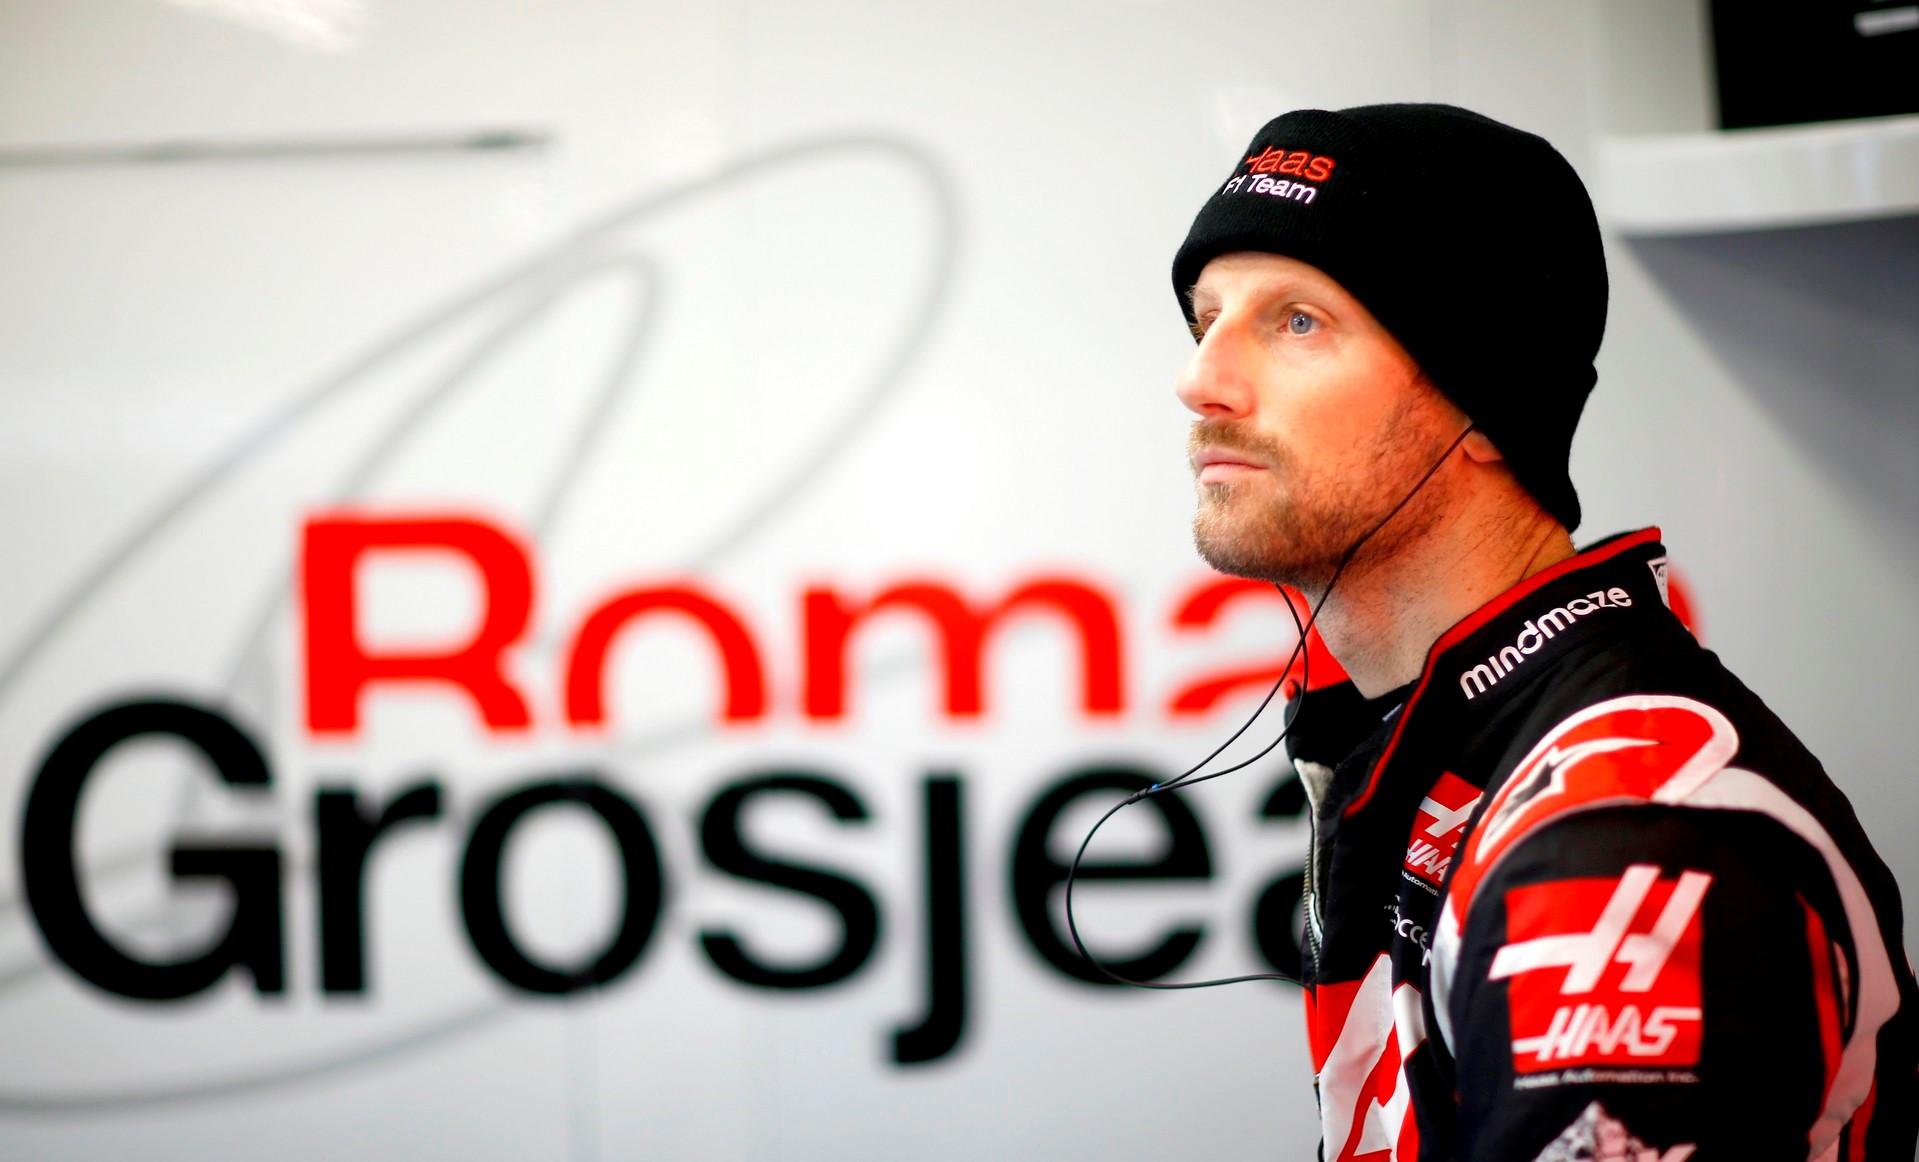 Grosjean teme che la Haas abbandonerà la Formula 1